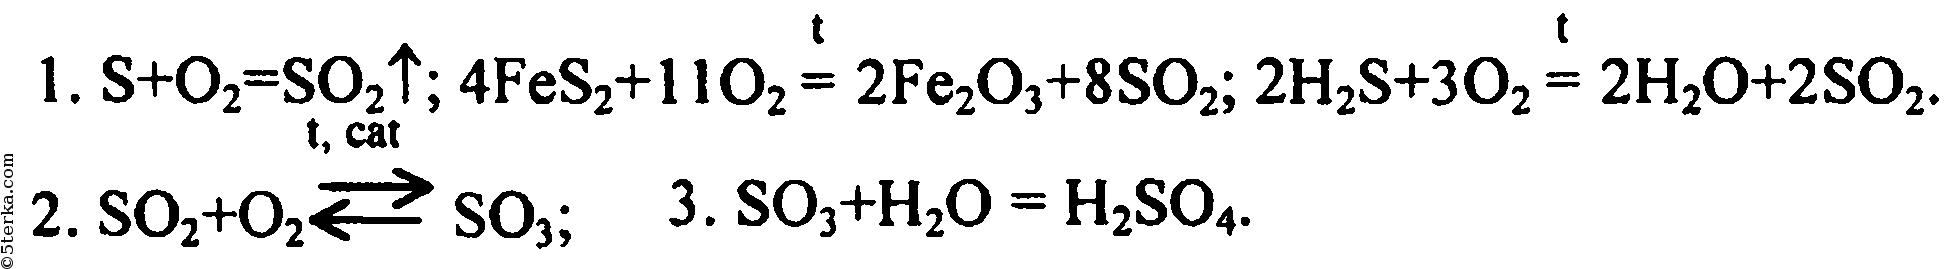 3 Напишите уравнения реакций,